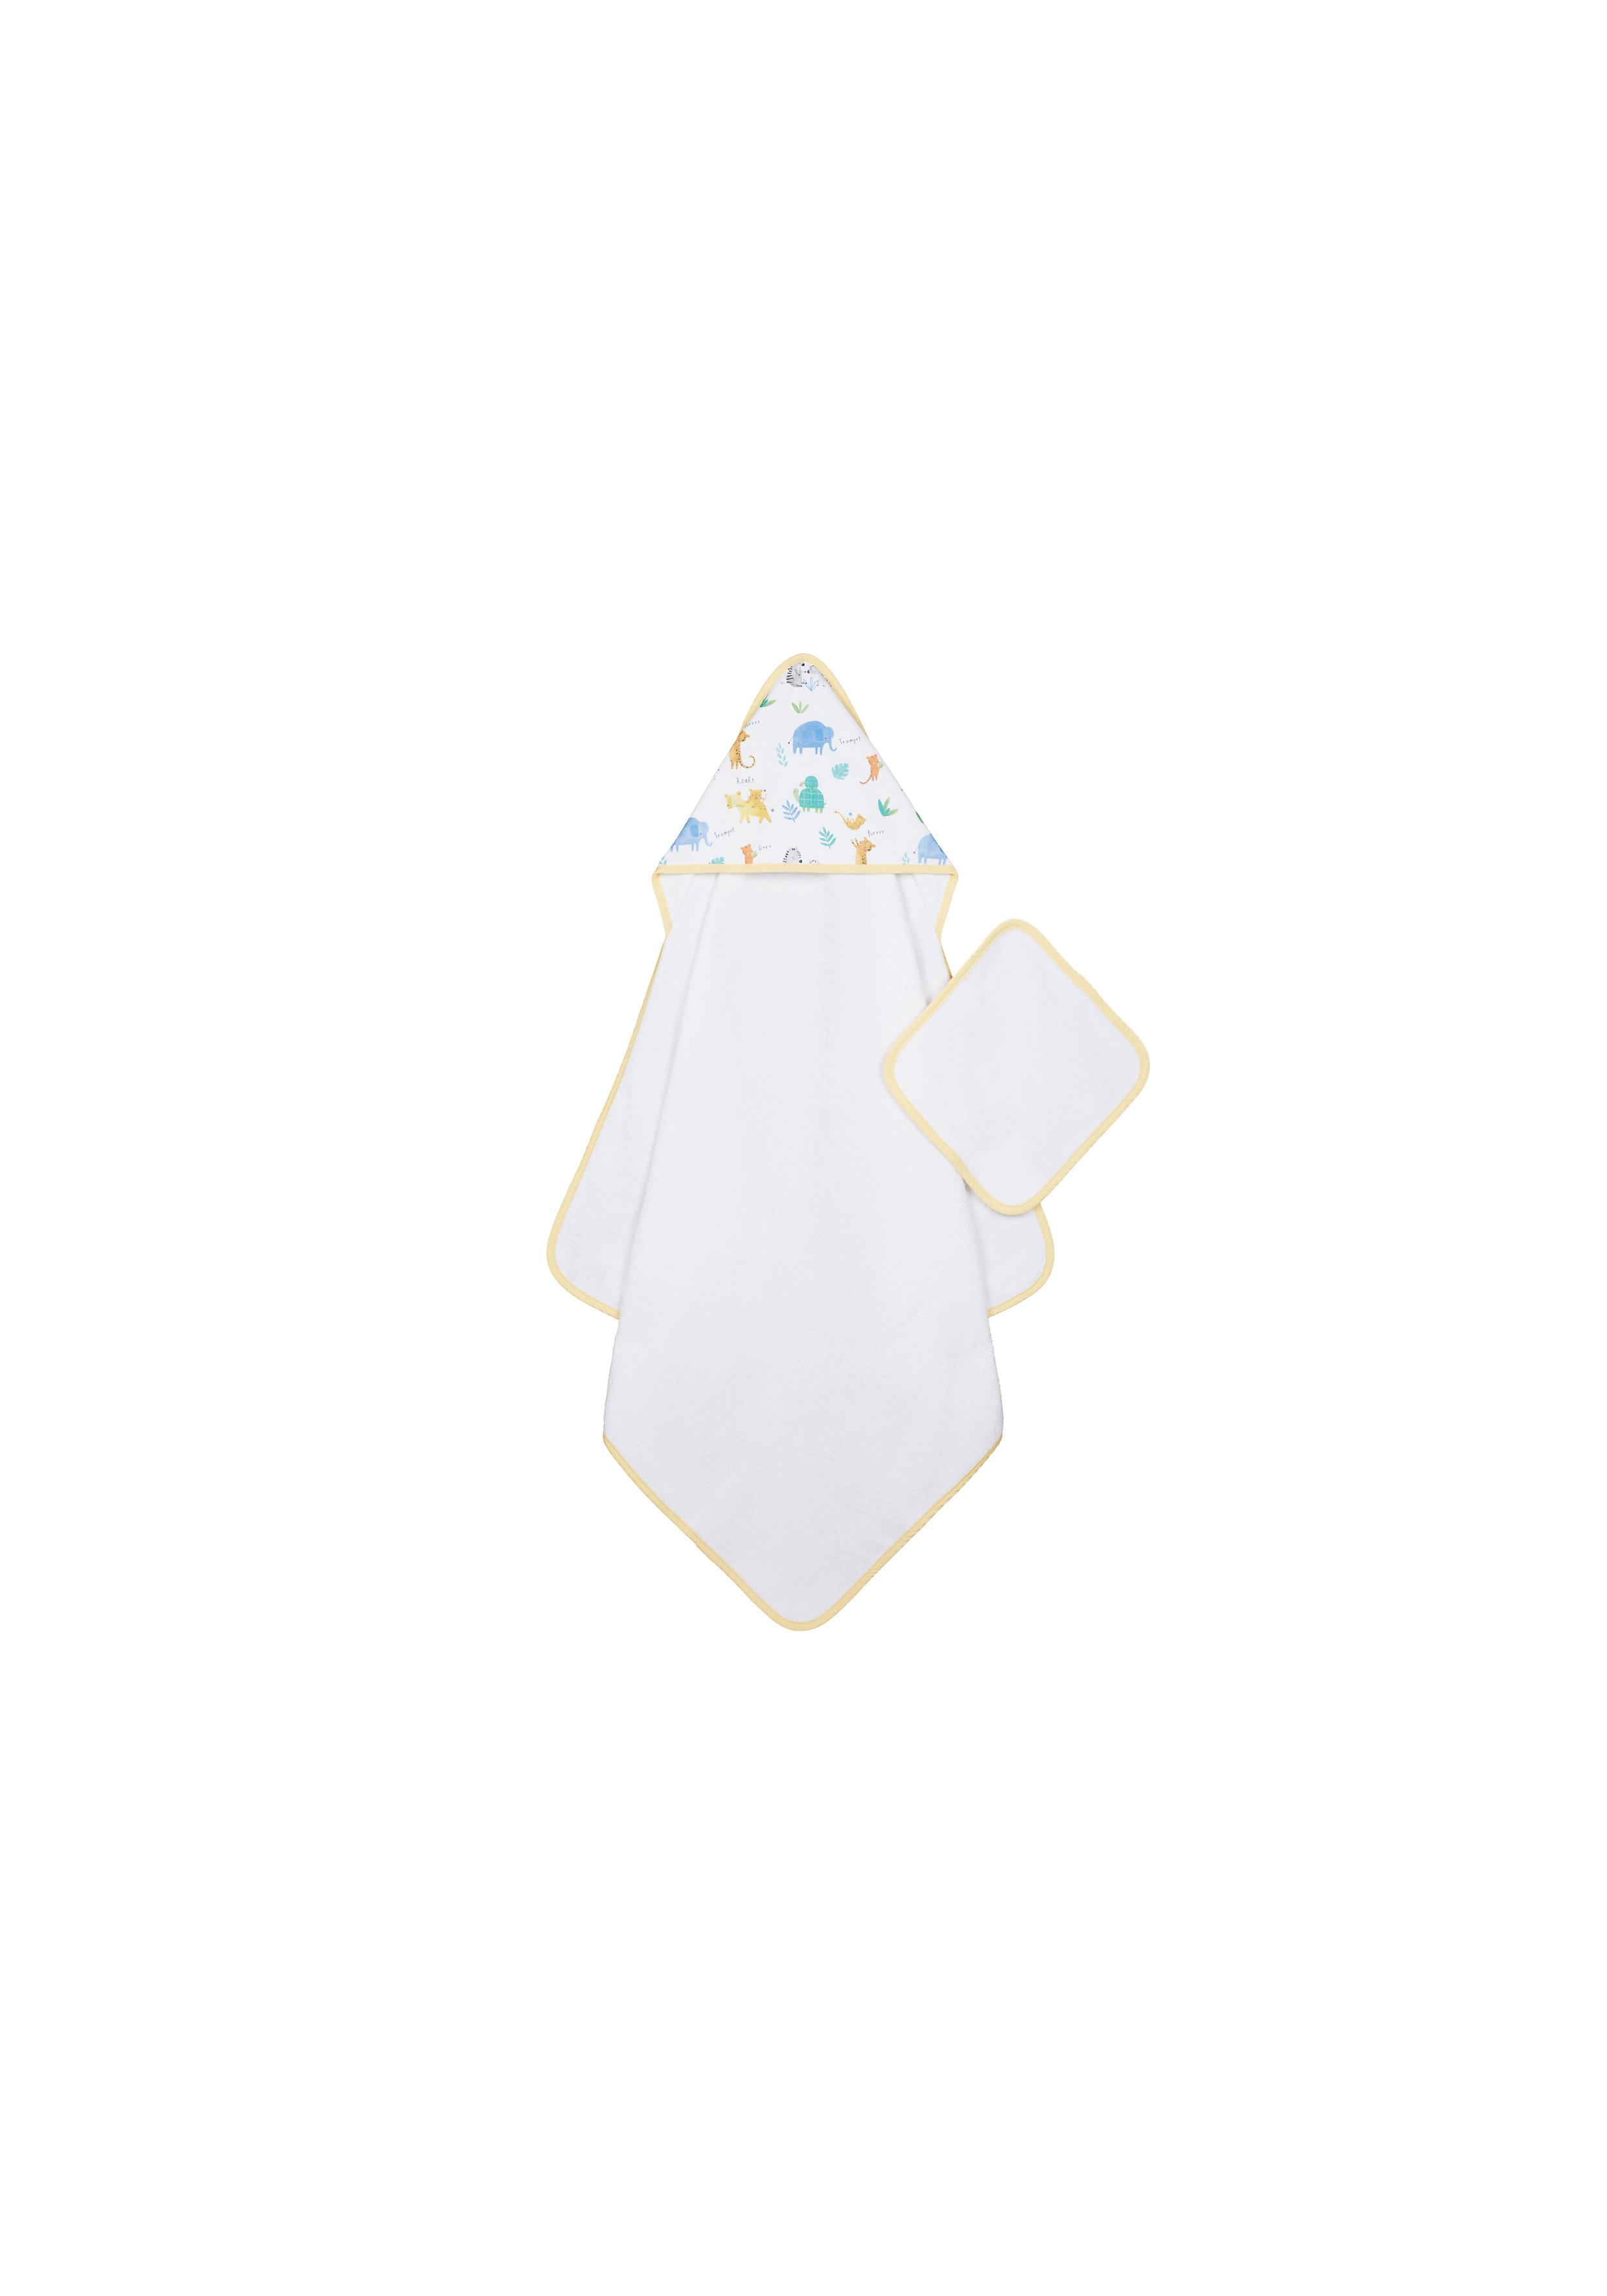 Mothercare | Mothercare Sleepy Safari Cuddle And Dry & Mitt White